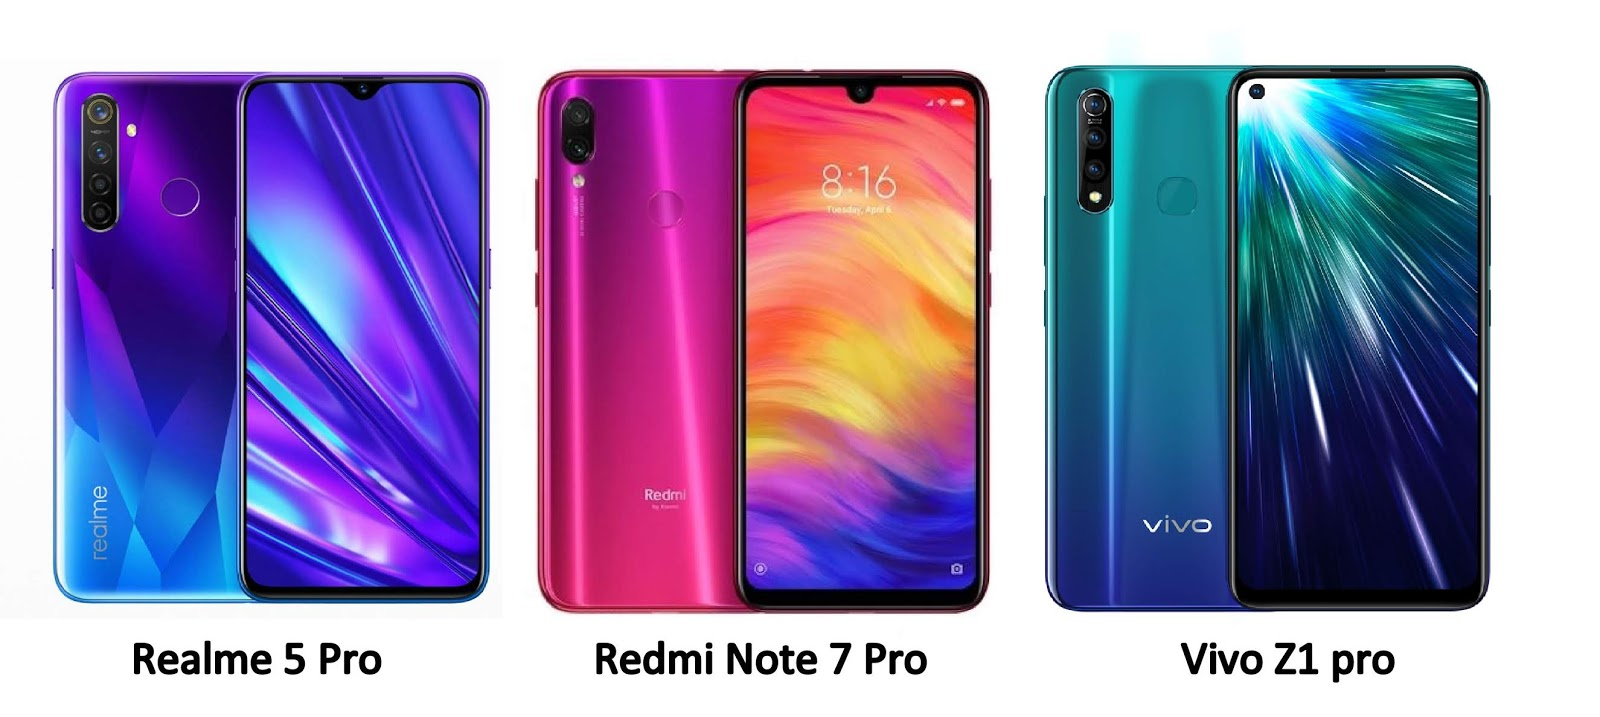 Realme 5 Pro vs Redmi Note 7 Pro vs Vivo Z1 Pro - Tech Updates